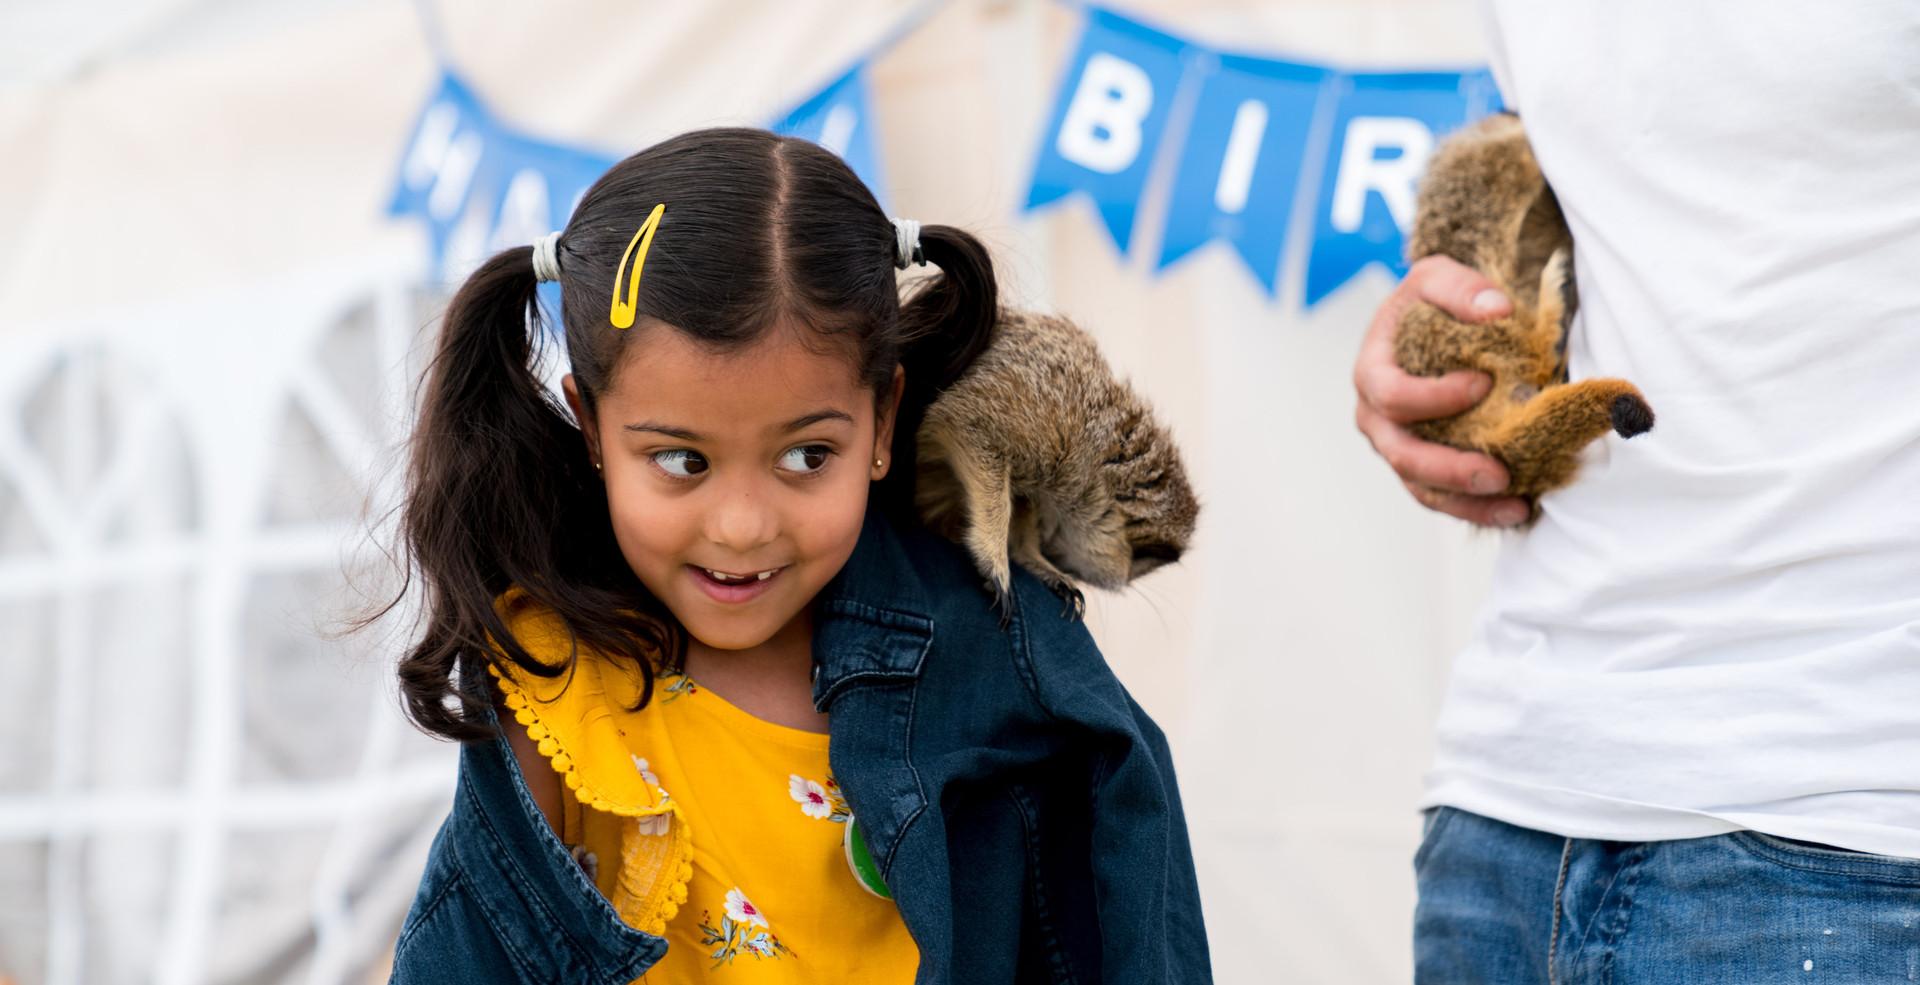 Childrens Party Animal Girl.jpg